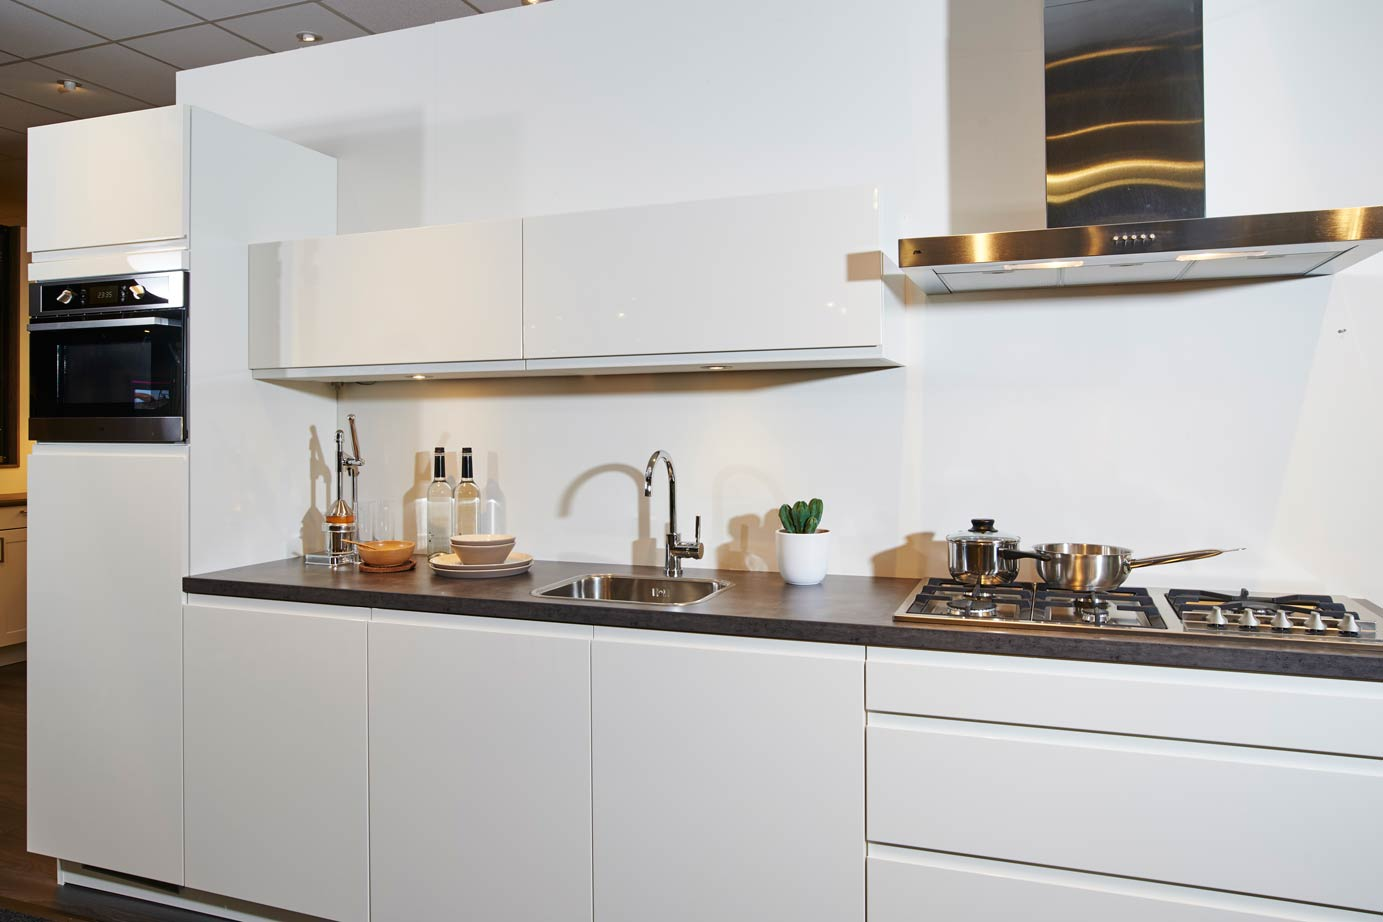 Greeploze Keuken Zelf Maken : Greeploze keuken. Strak design en prettig gebruik. – DB Keukens